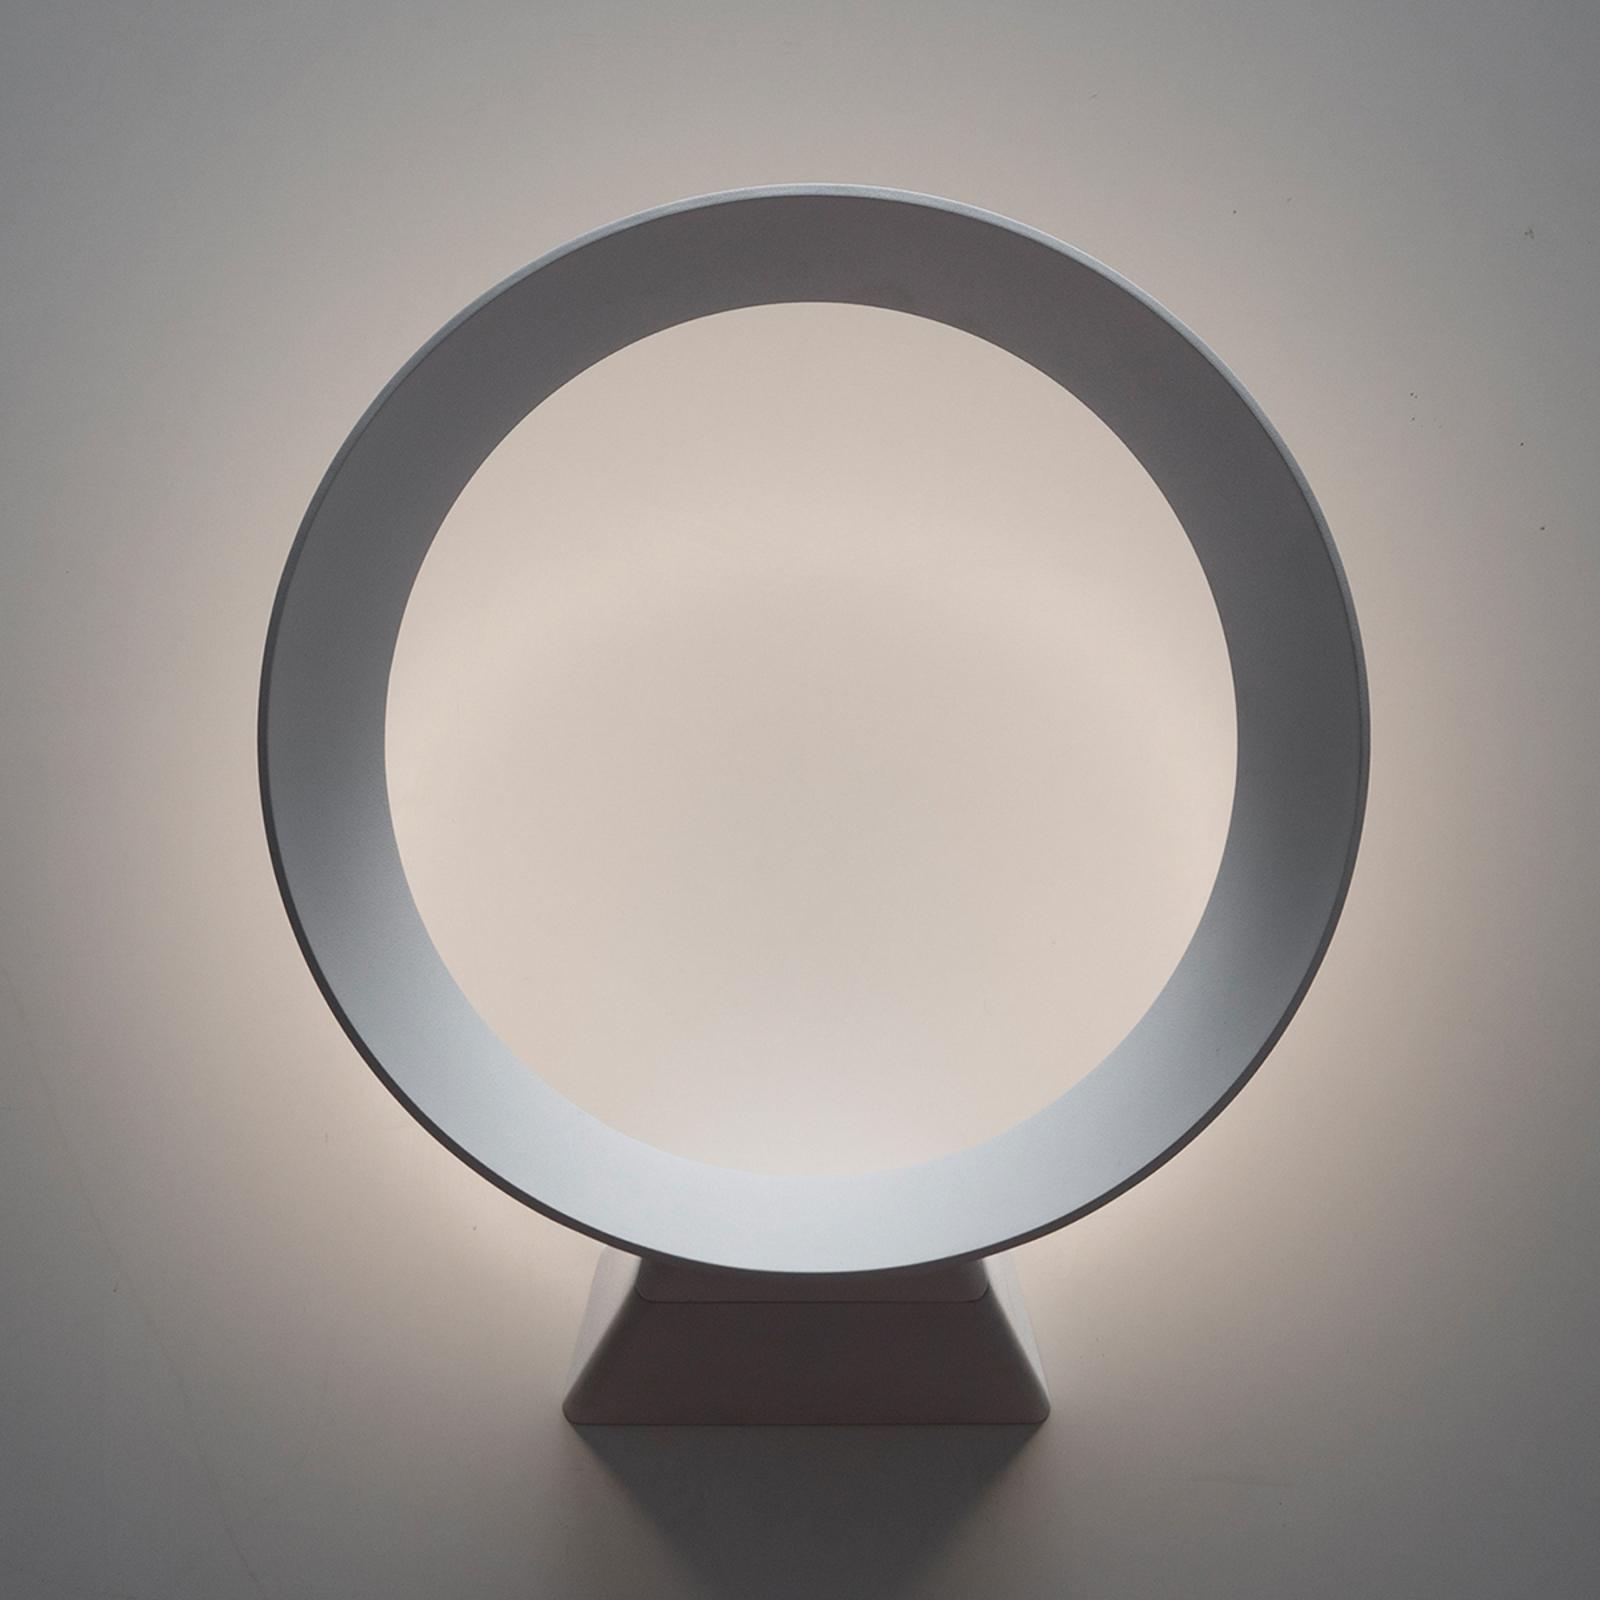 Martinelli Luce LED+O-seinävalaisin 16 W 3 000 K